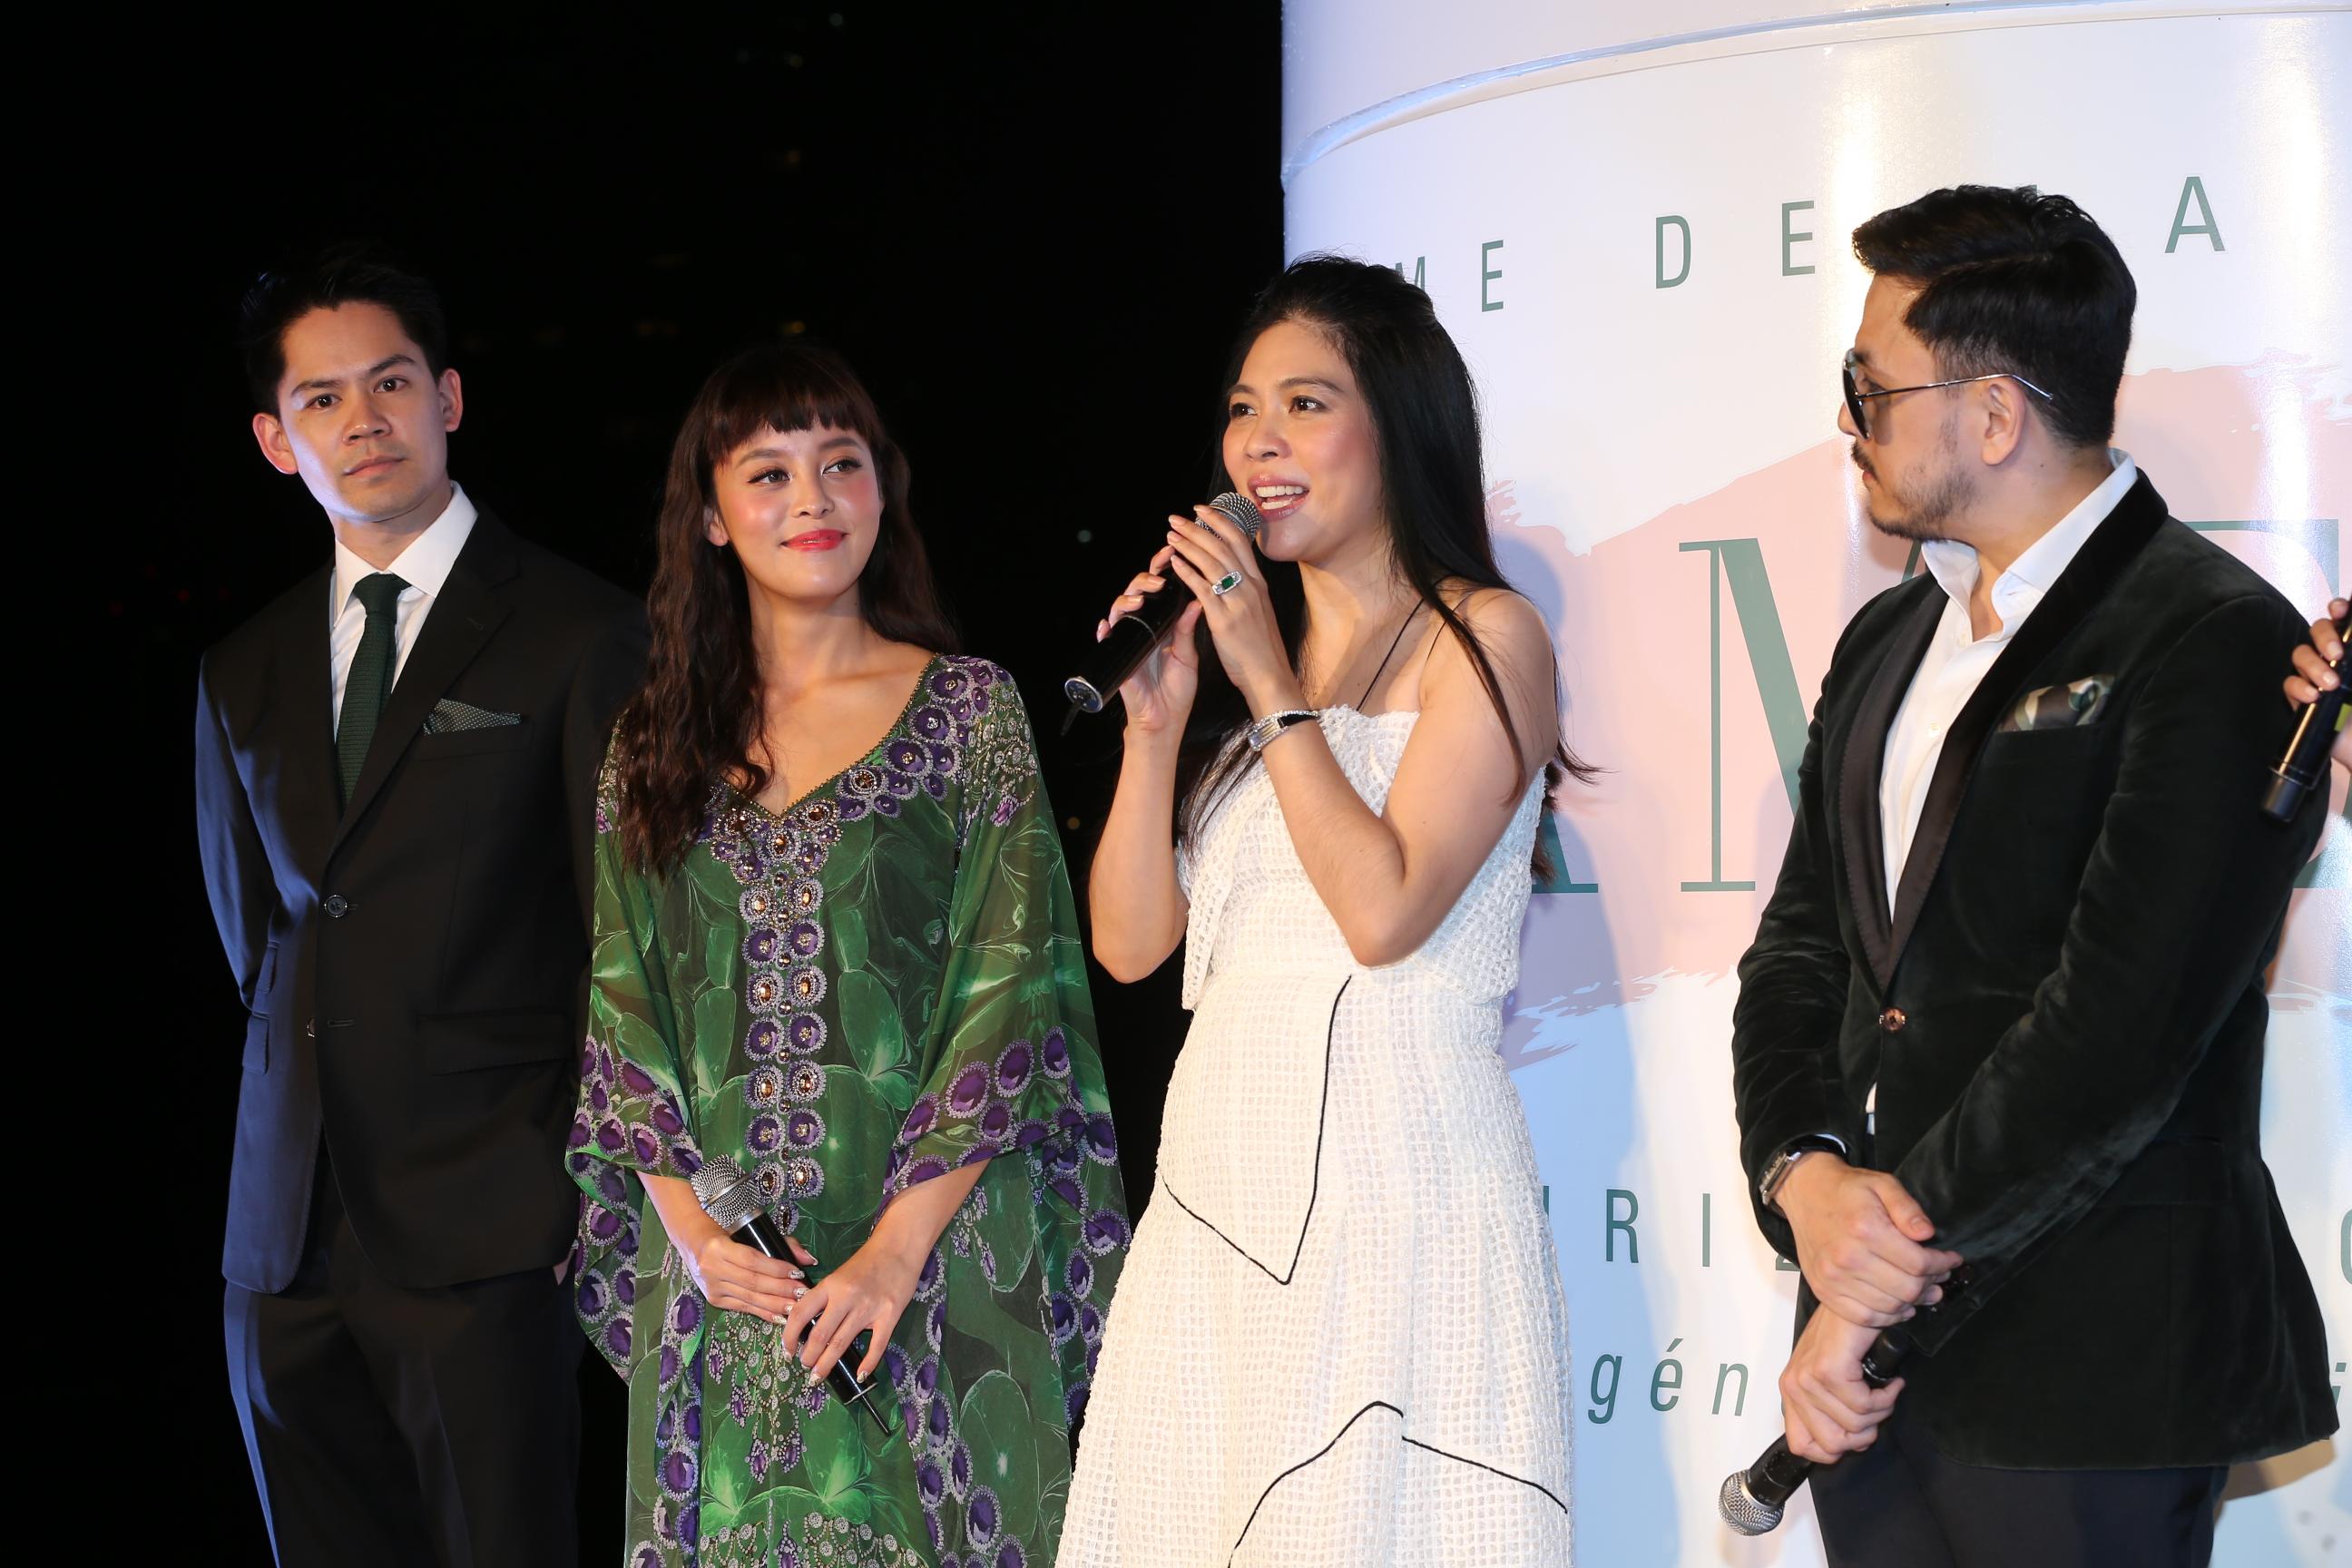 5 best Thai beauty brands in Bangkok - LifestyleAsia Bangkok